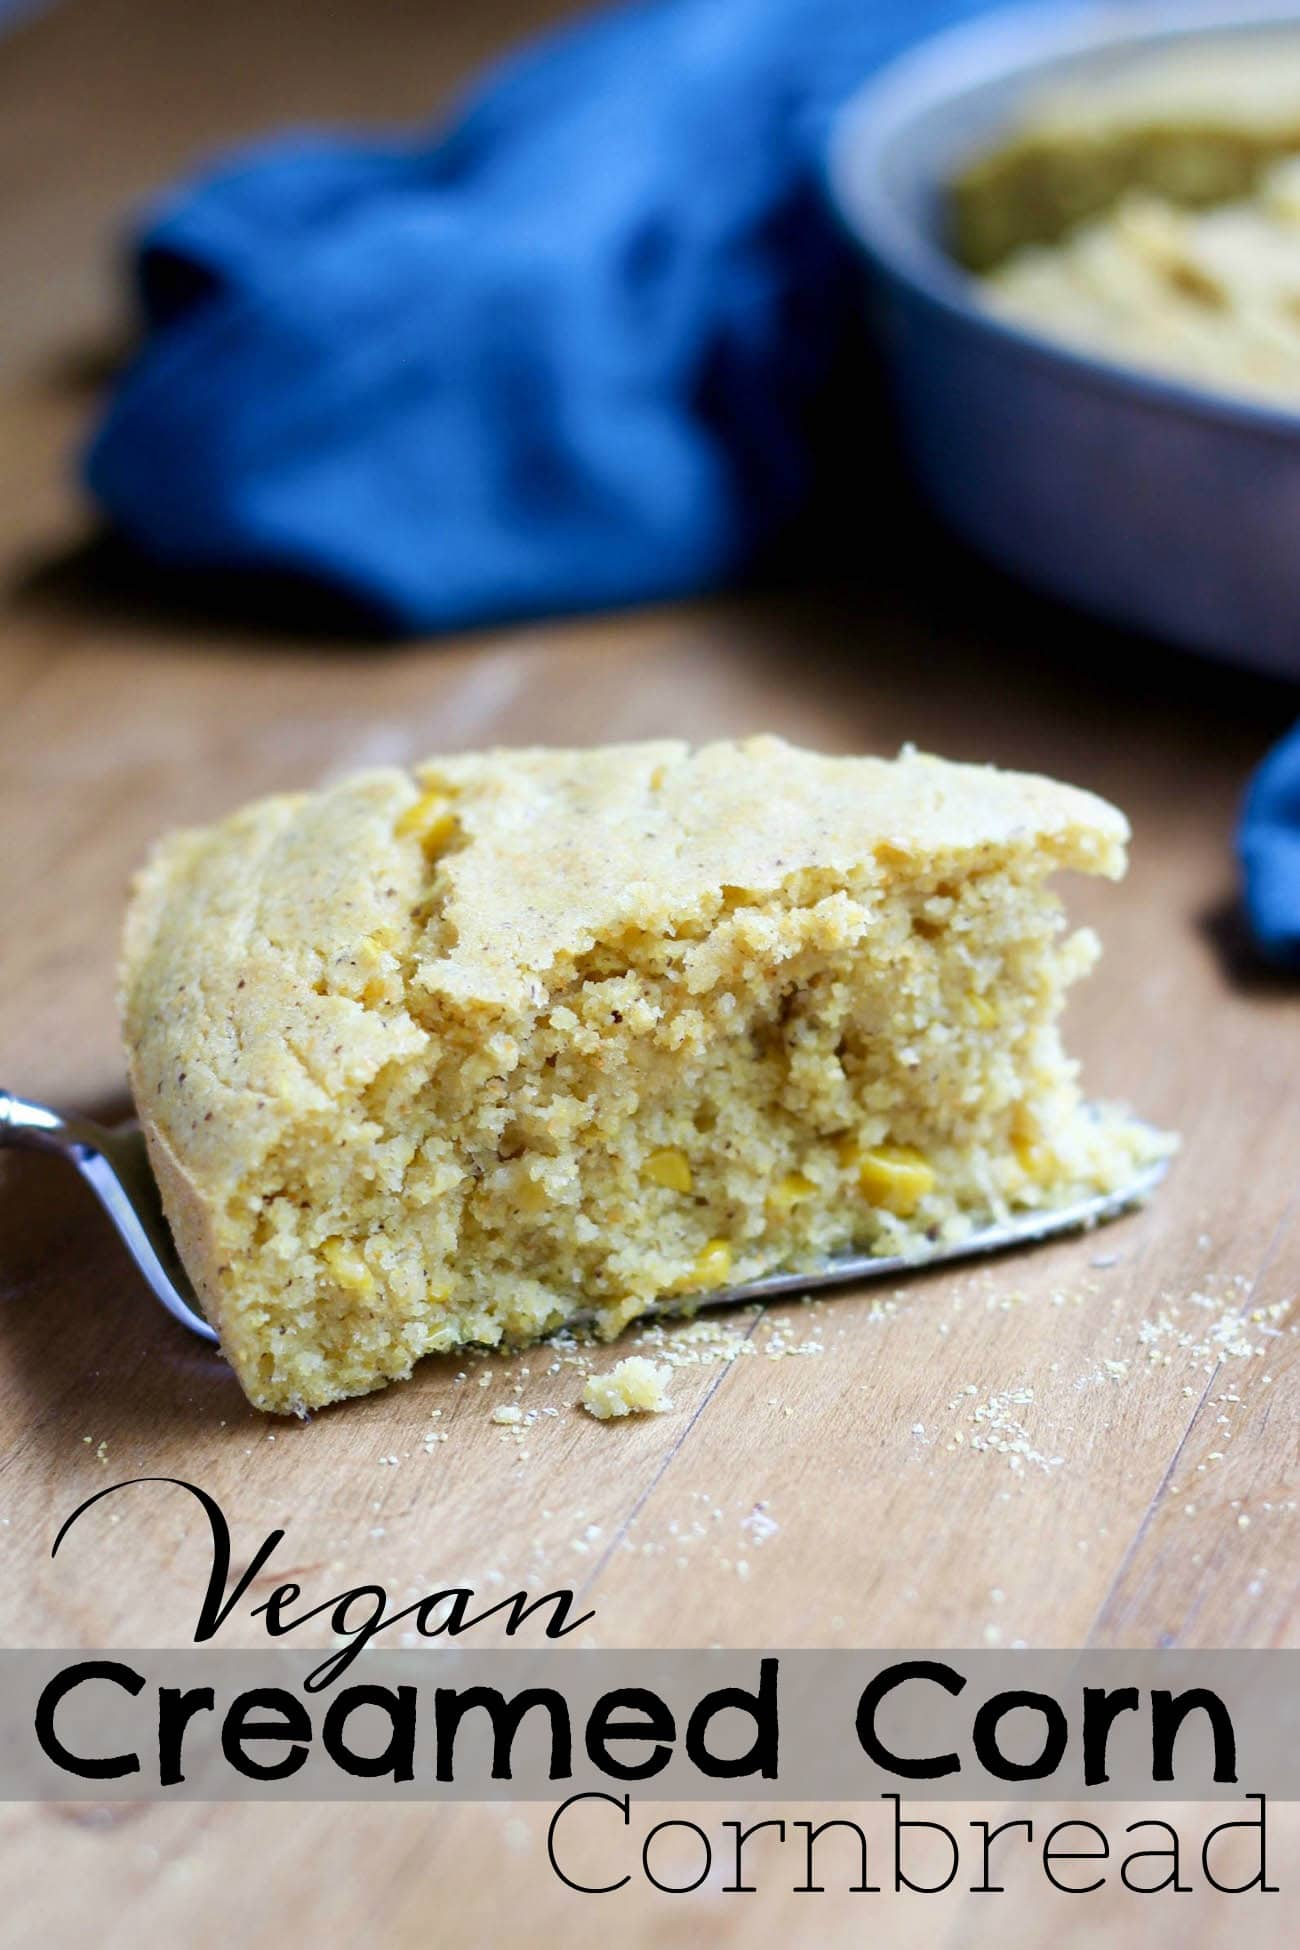 Vegan Creamed Corn Cornbread Recipe